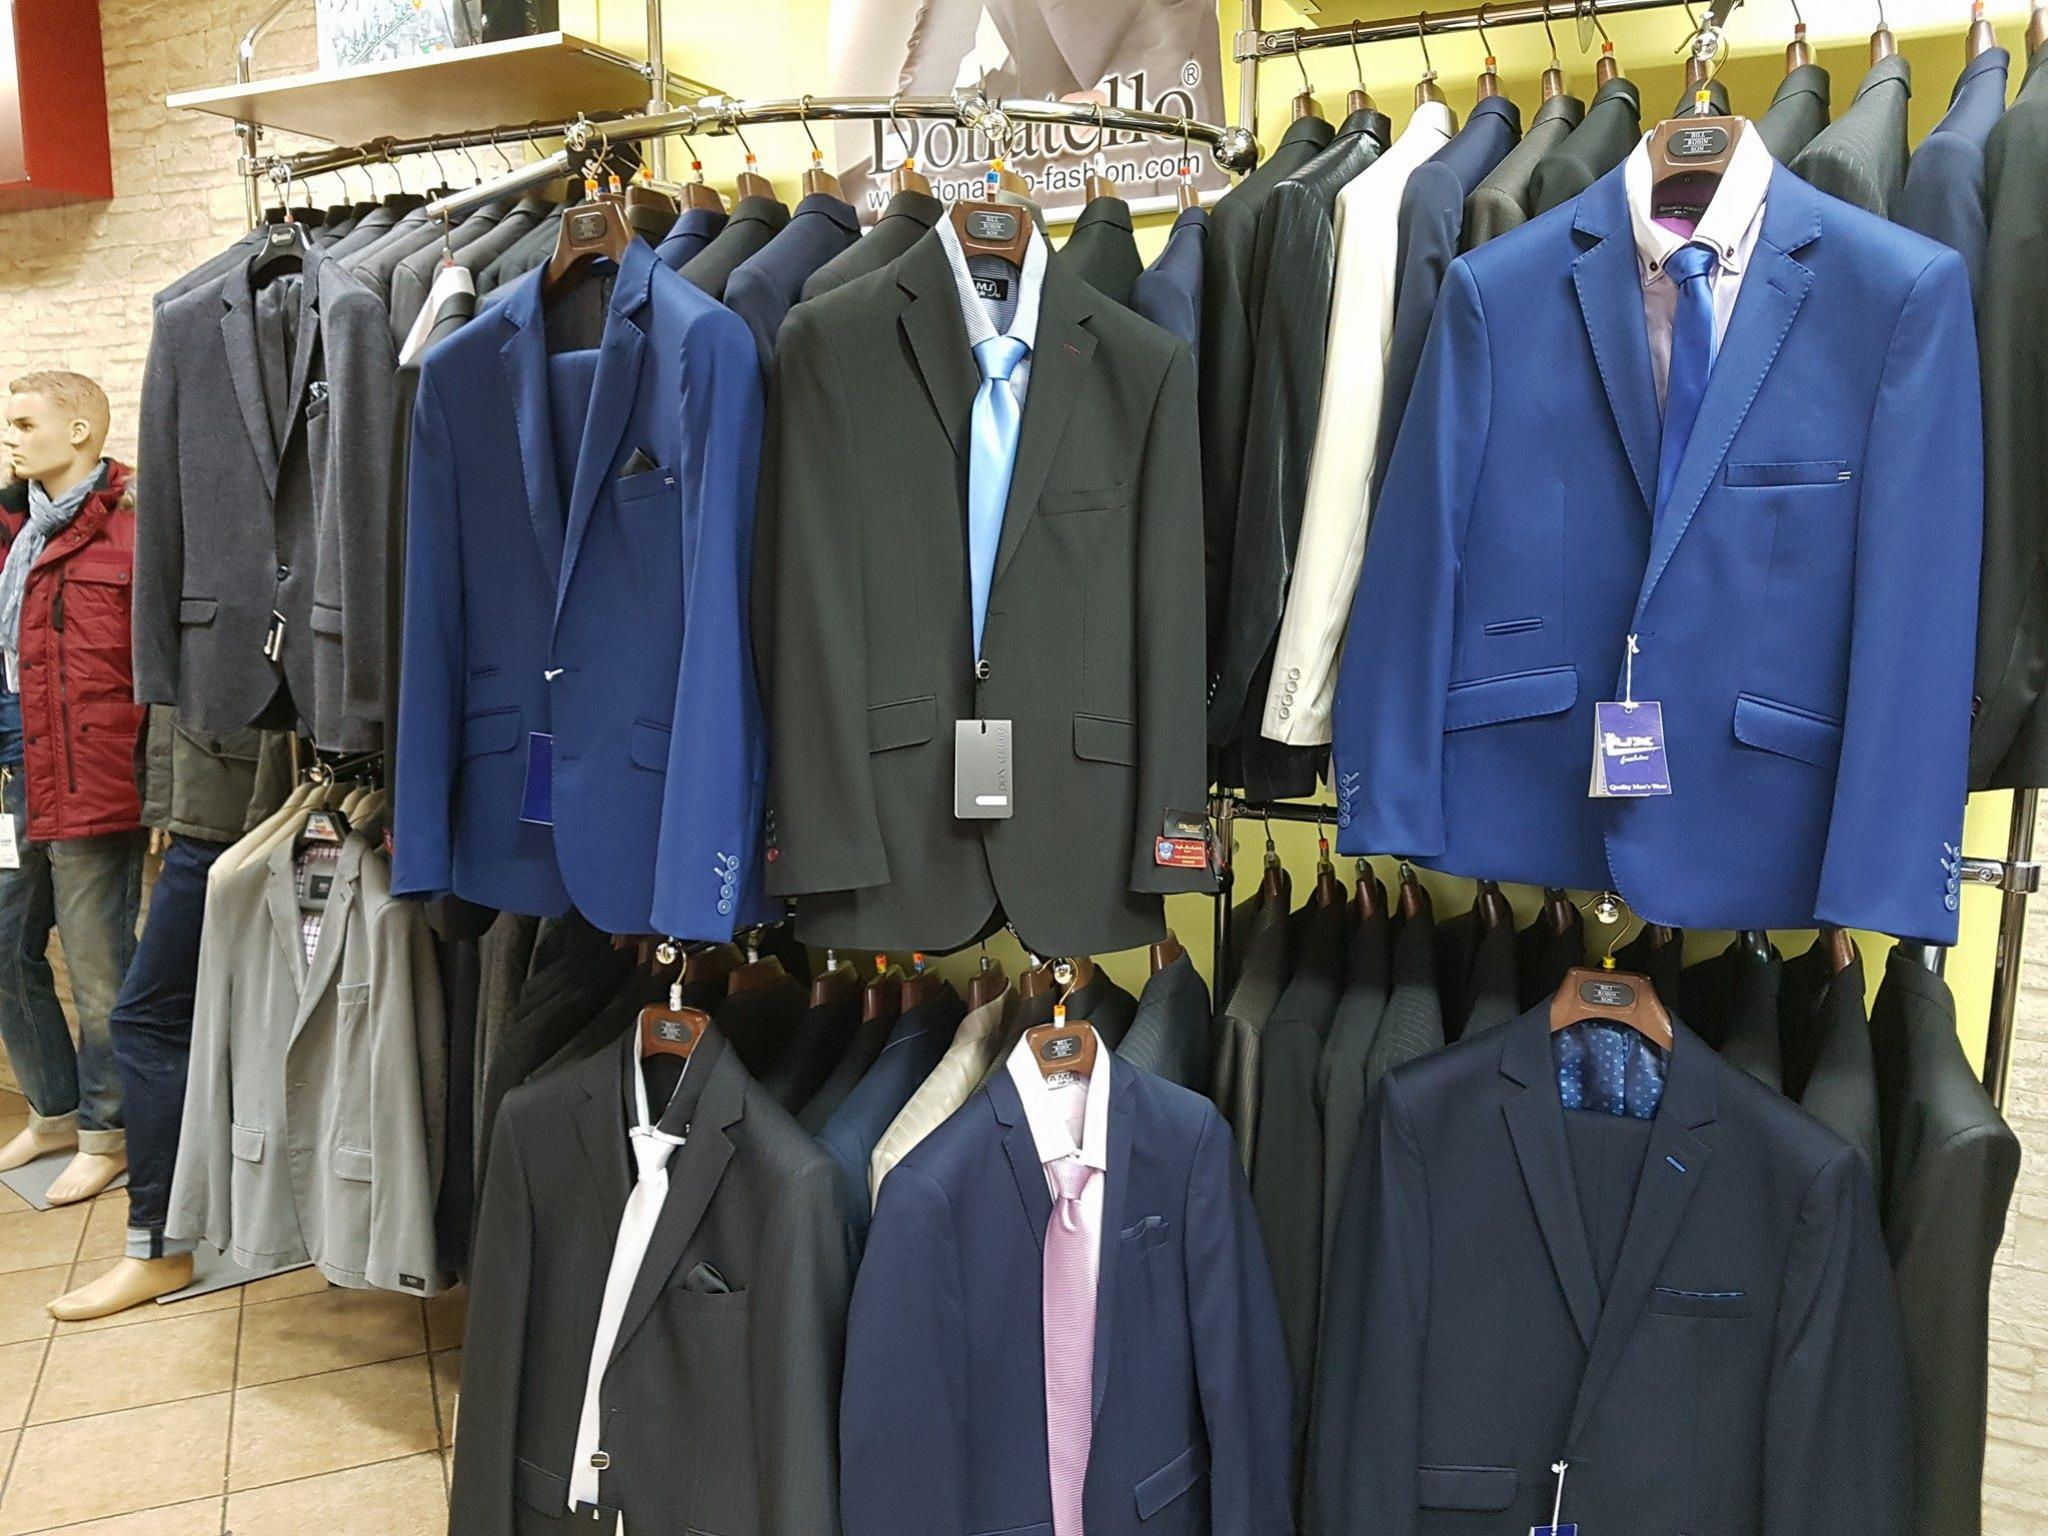 odevy lux fashion topoľčany pánske obleky topoľčany 5990c59eea7